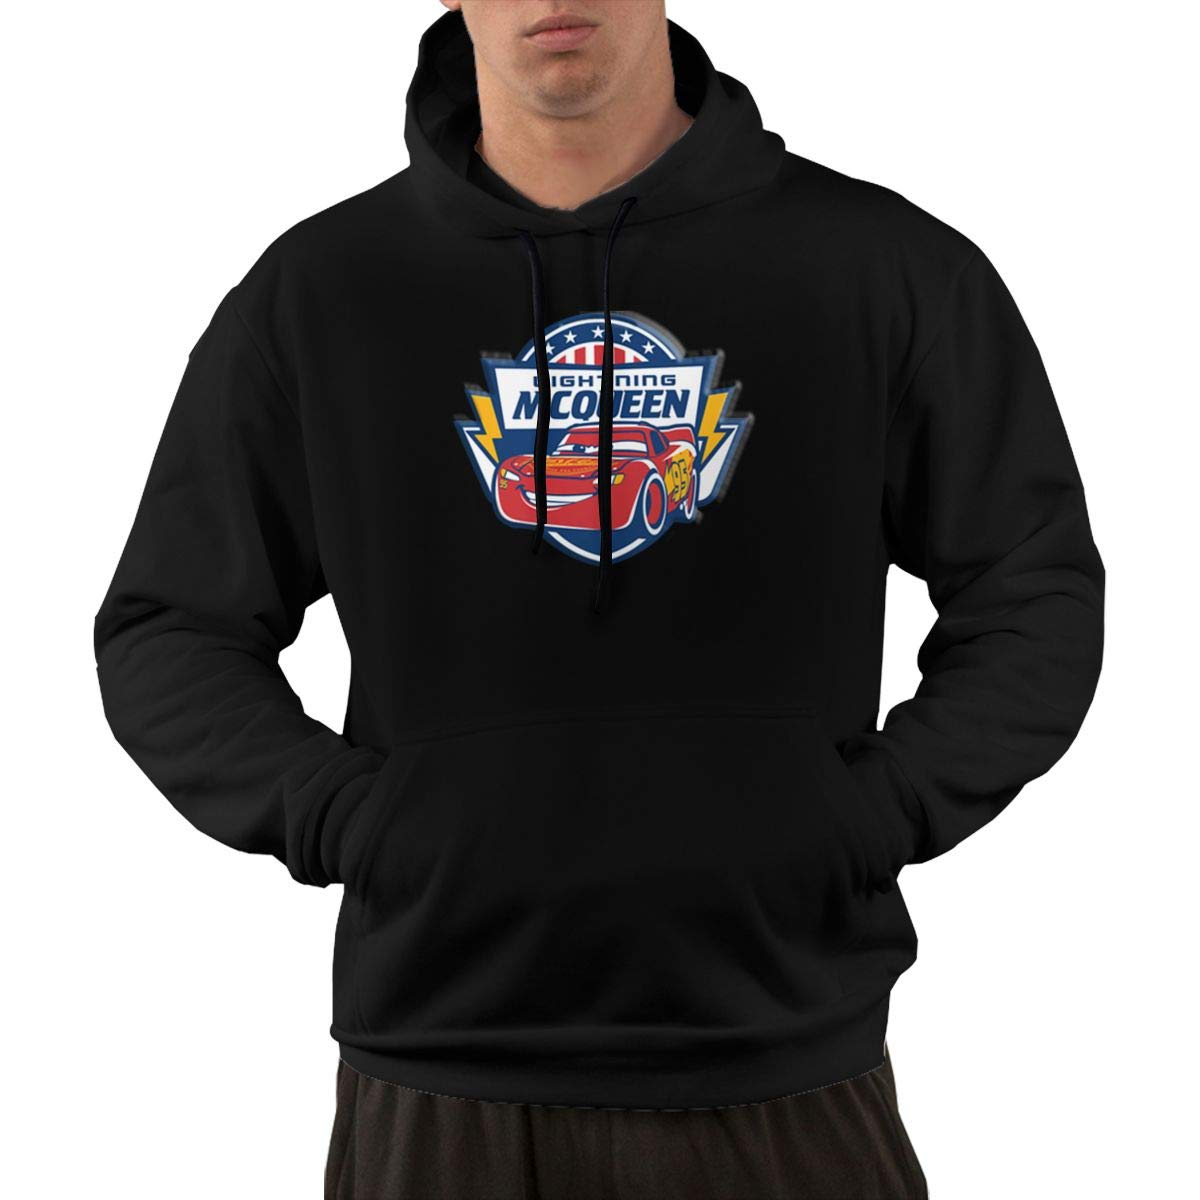 Cars Hoodie Mens Fashion Long Sleeve Hoodie Top Hoodie Shirt with Front Pocket